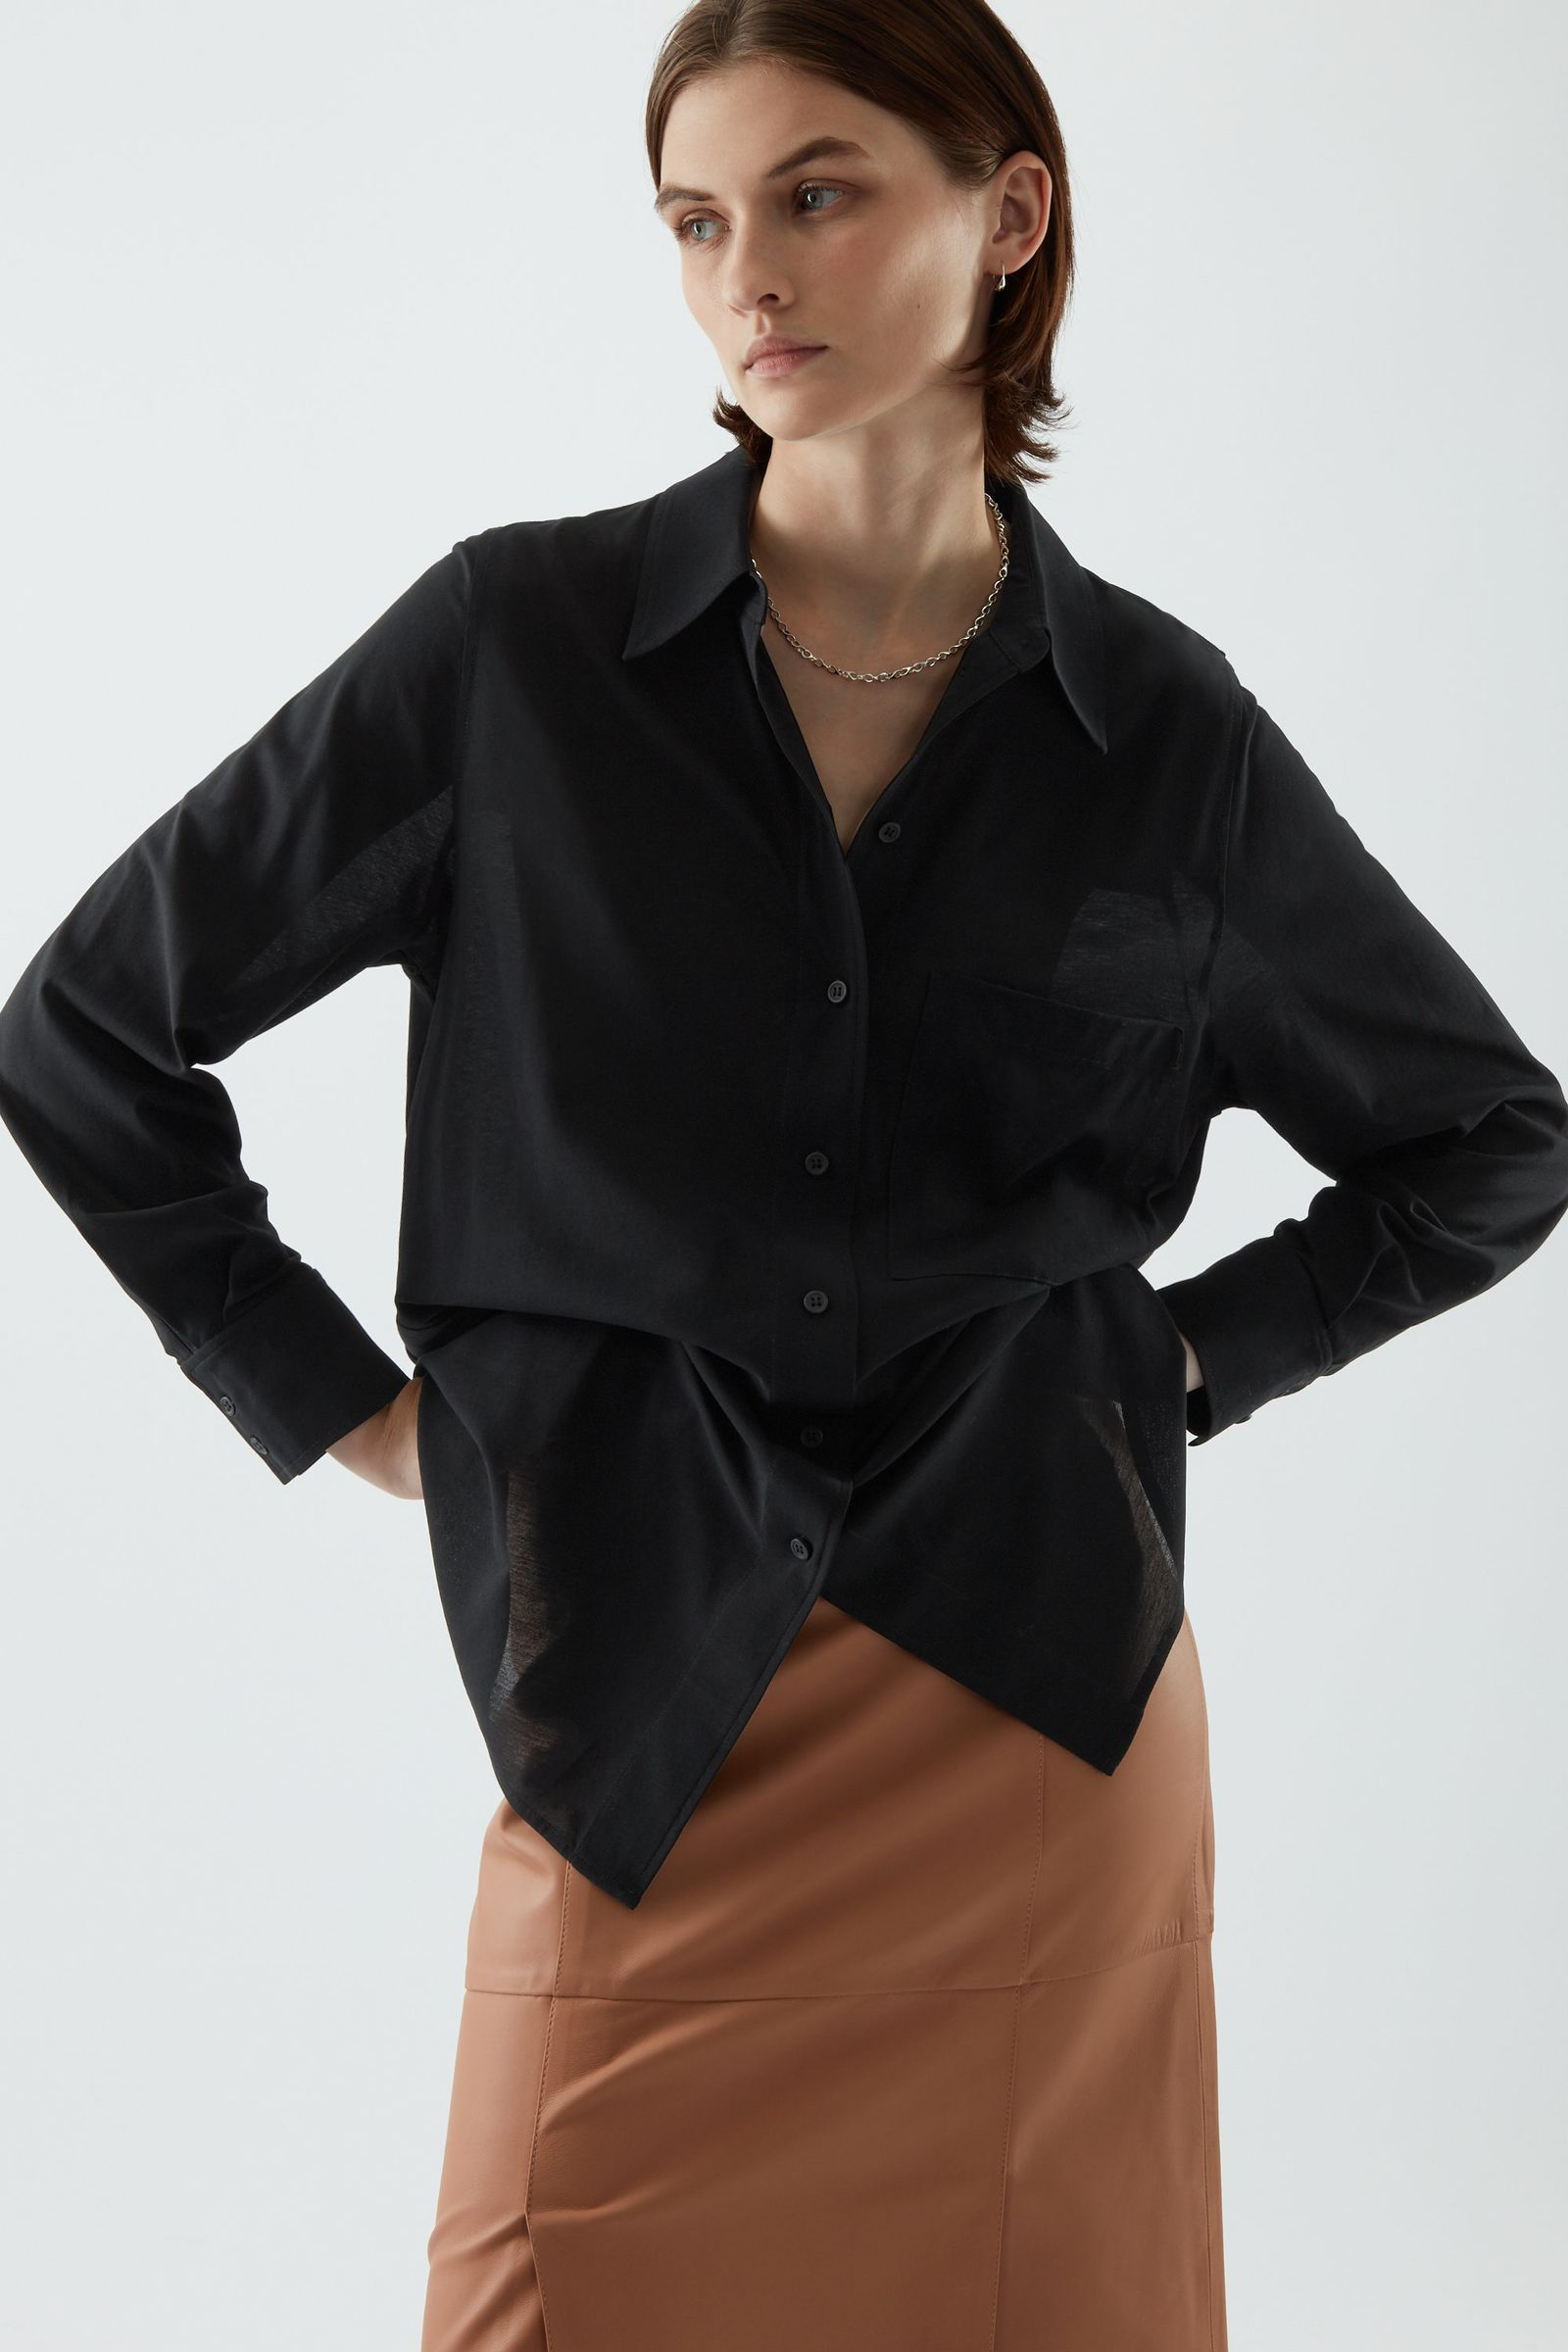 COS 코튼 보이프렌드 셔츠의 블랙컬러 ECOMLook입니다.